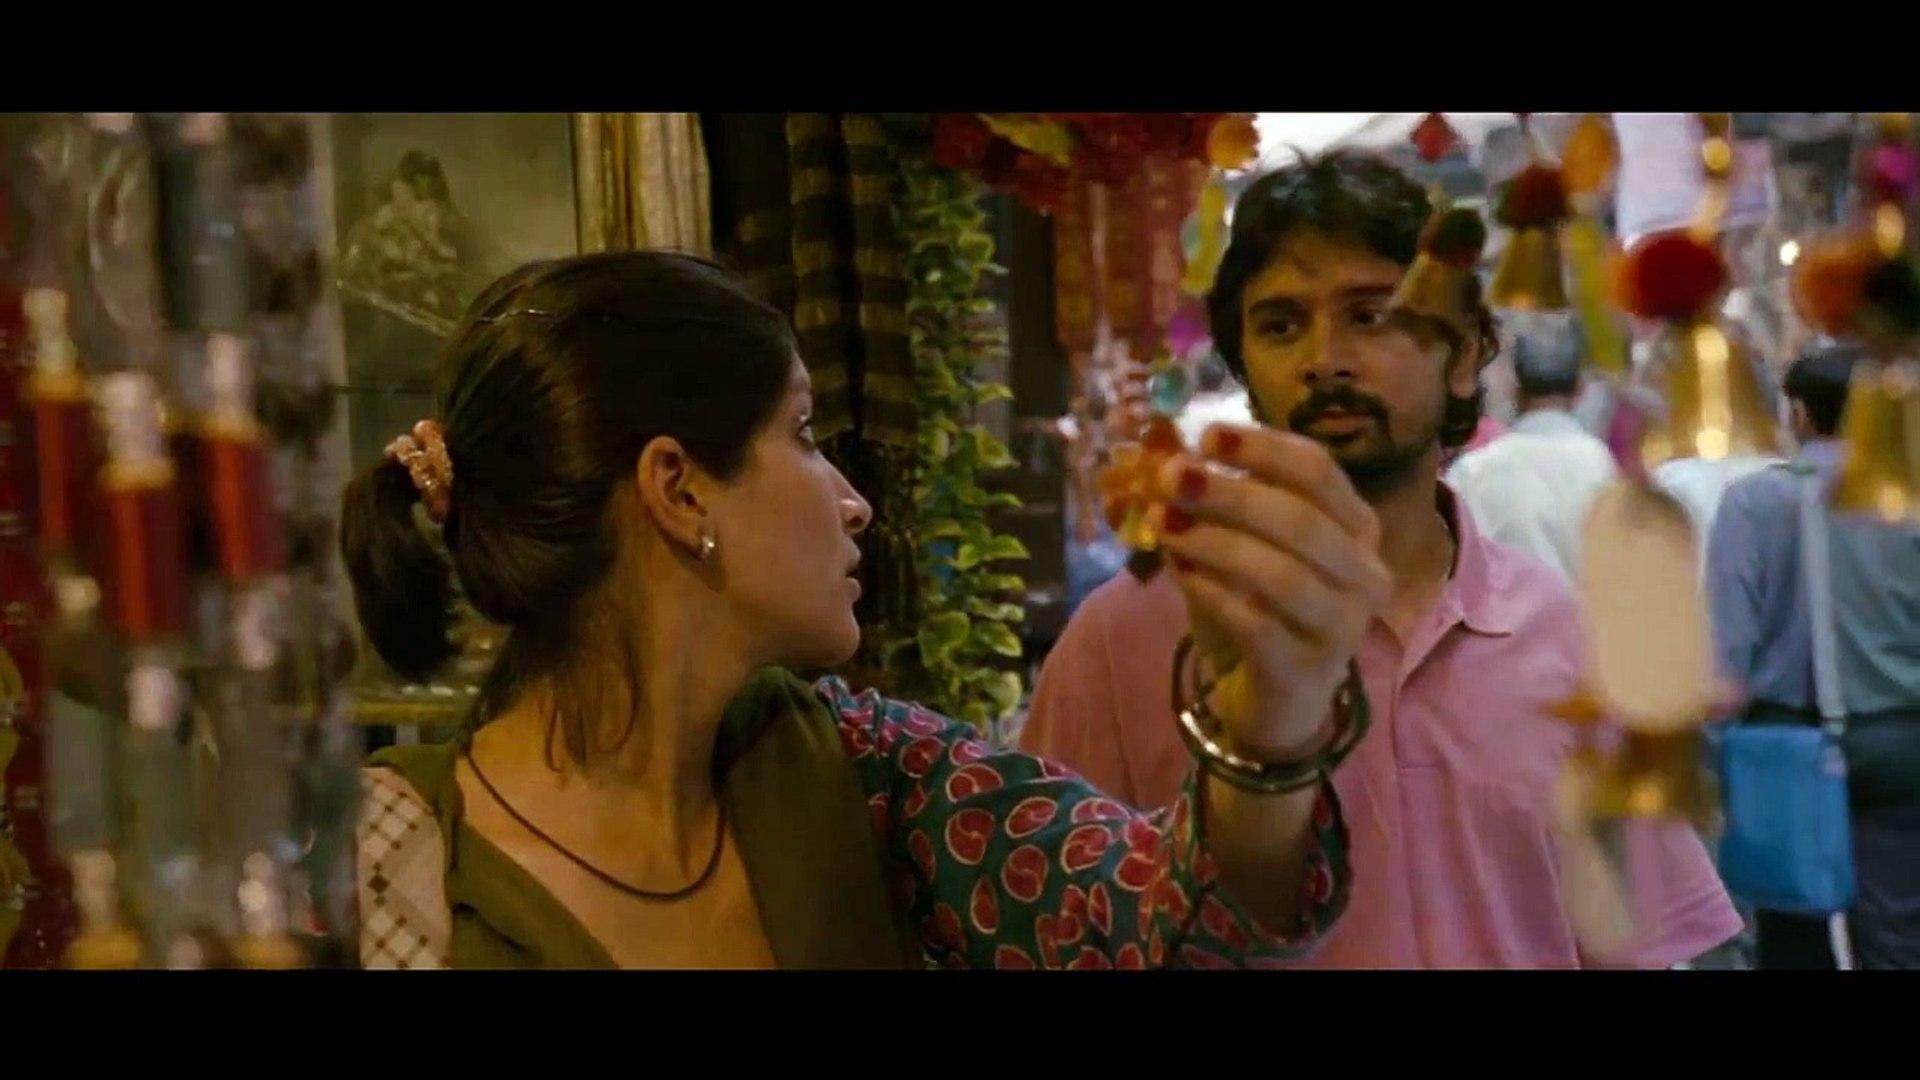 Hindi Movies 2014 Full Movie - Best Comedy Movies - Bollywood Movies - Romantic Movies